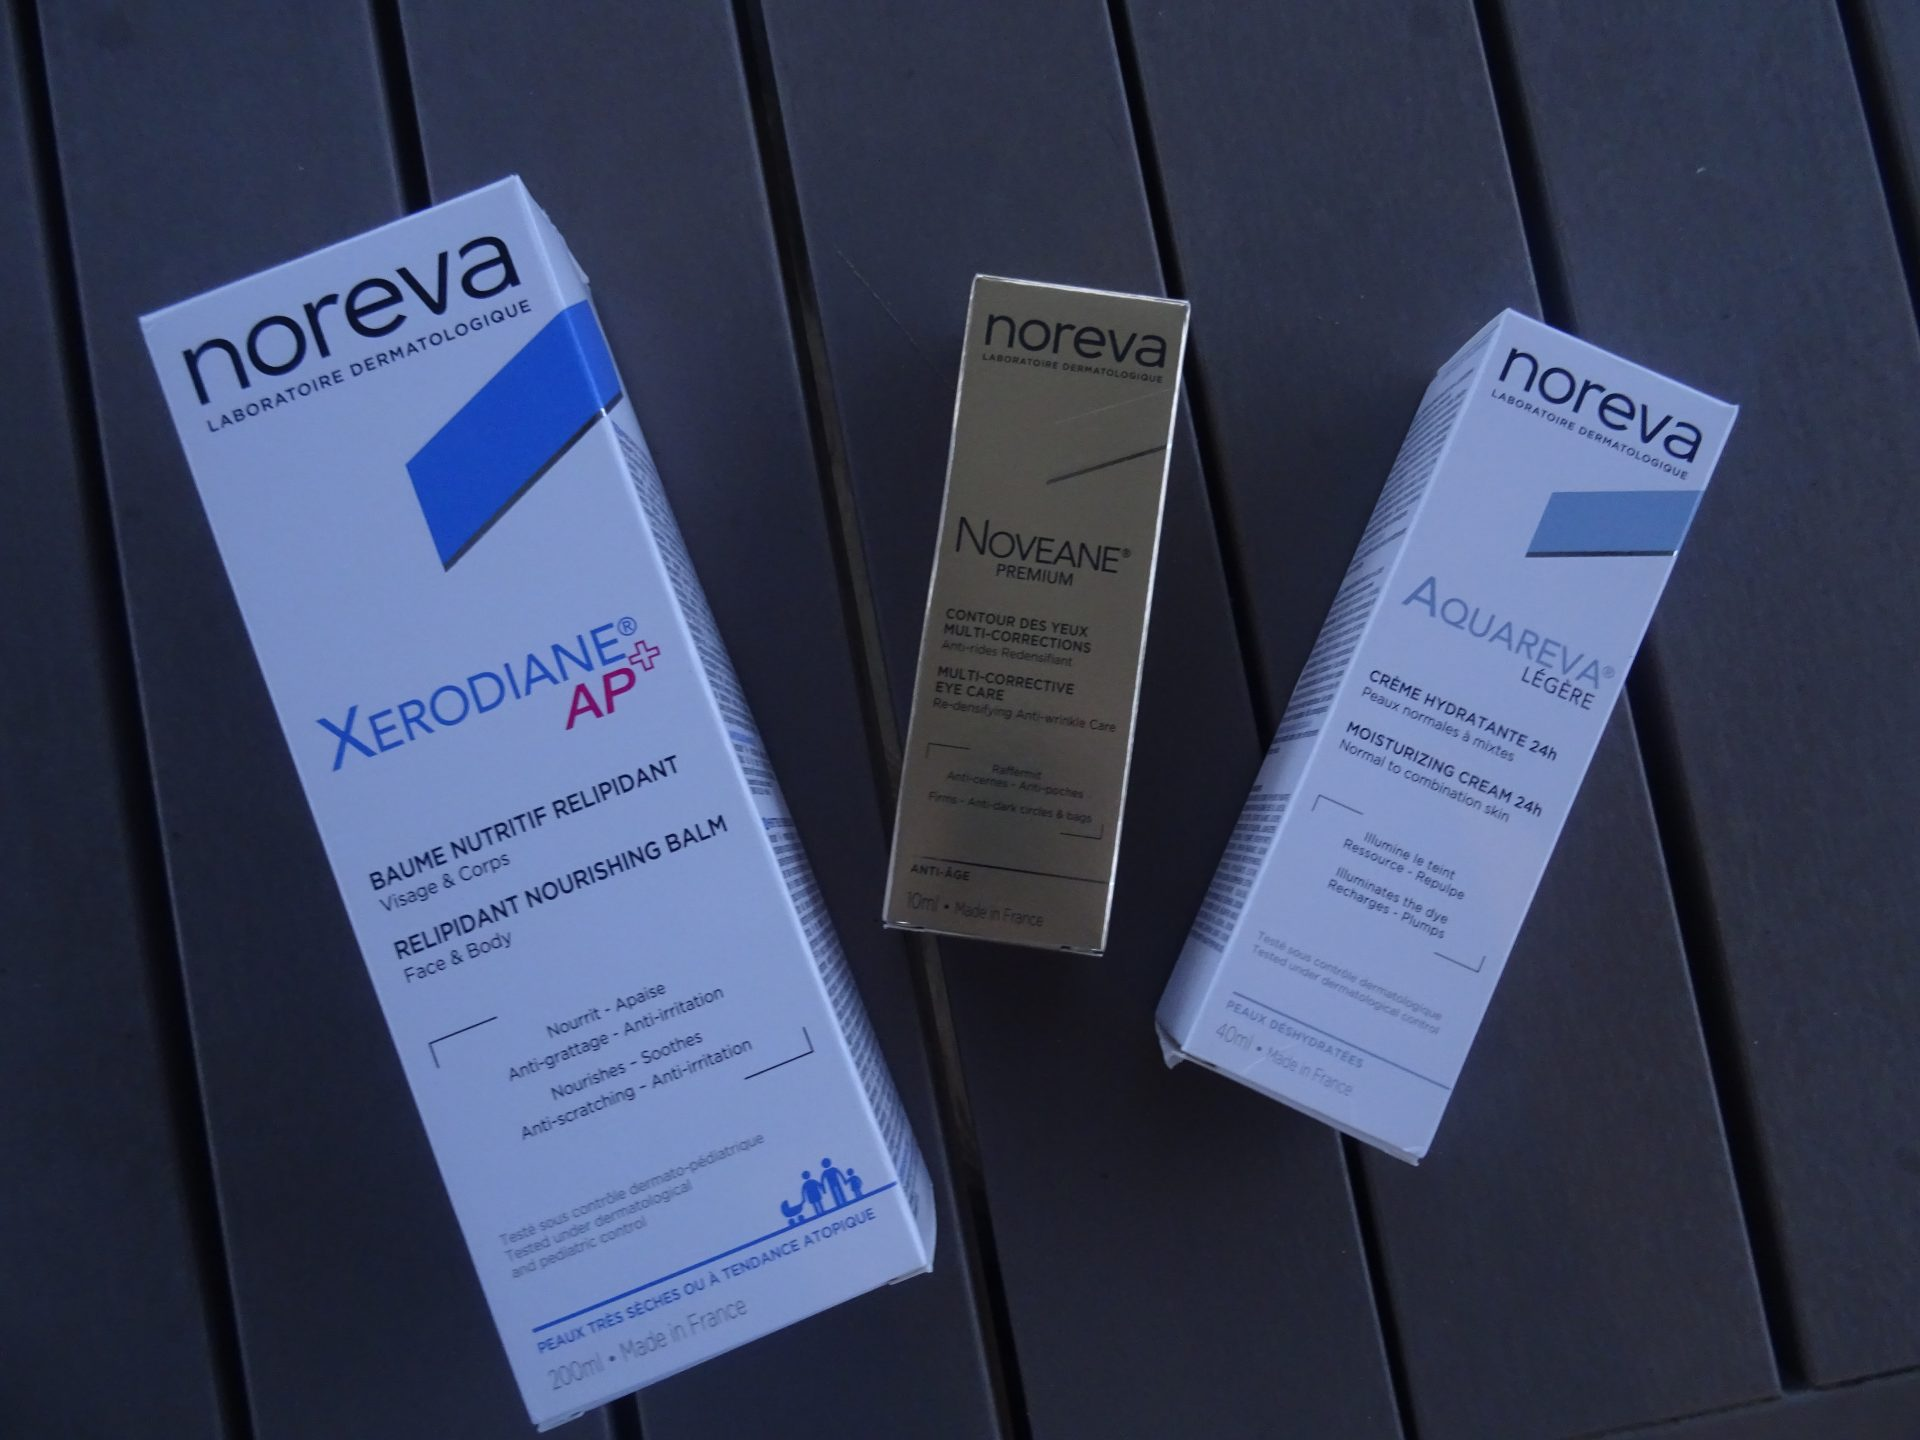 Je soigne ma peau avec les produits Noreva